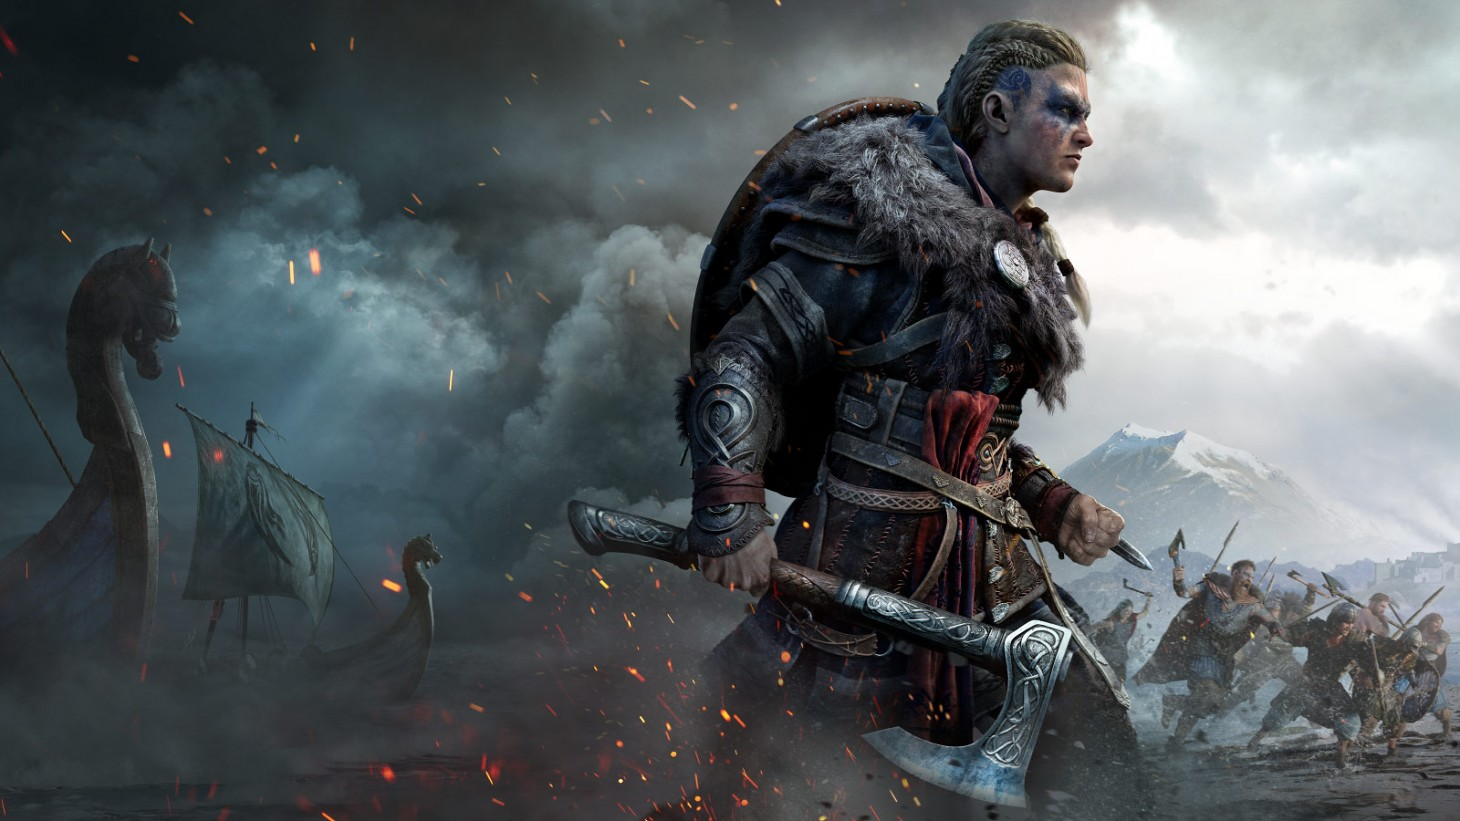 Assassin's Creed Valhalla Update 1.1.2